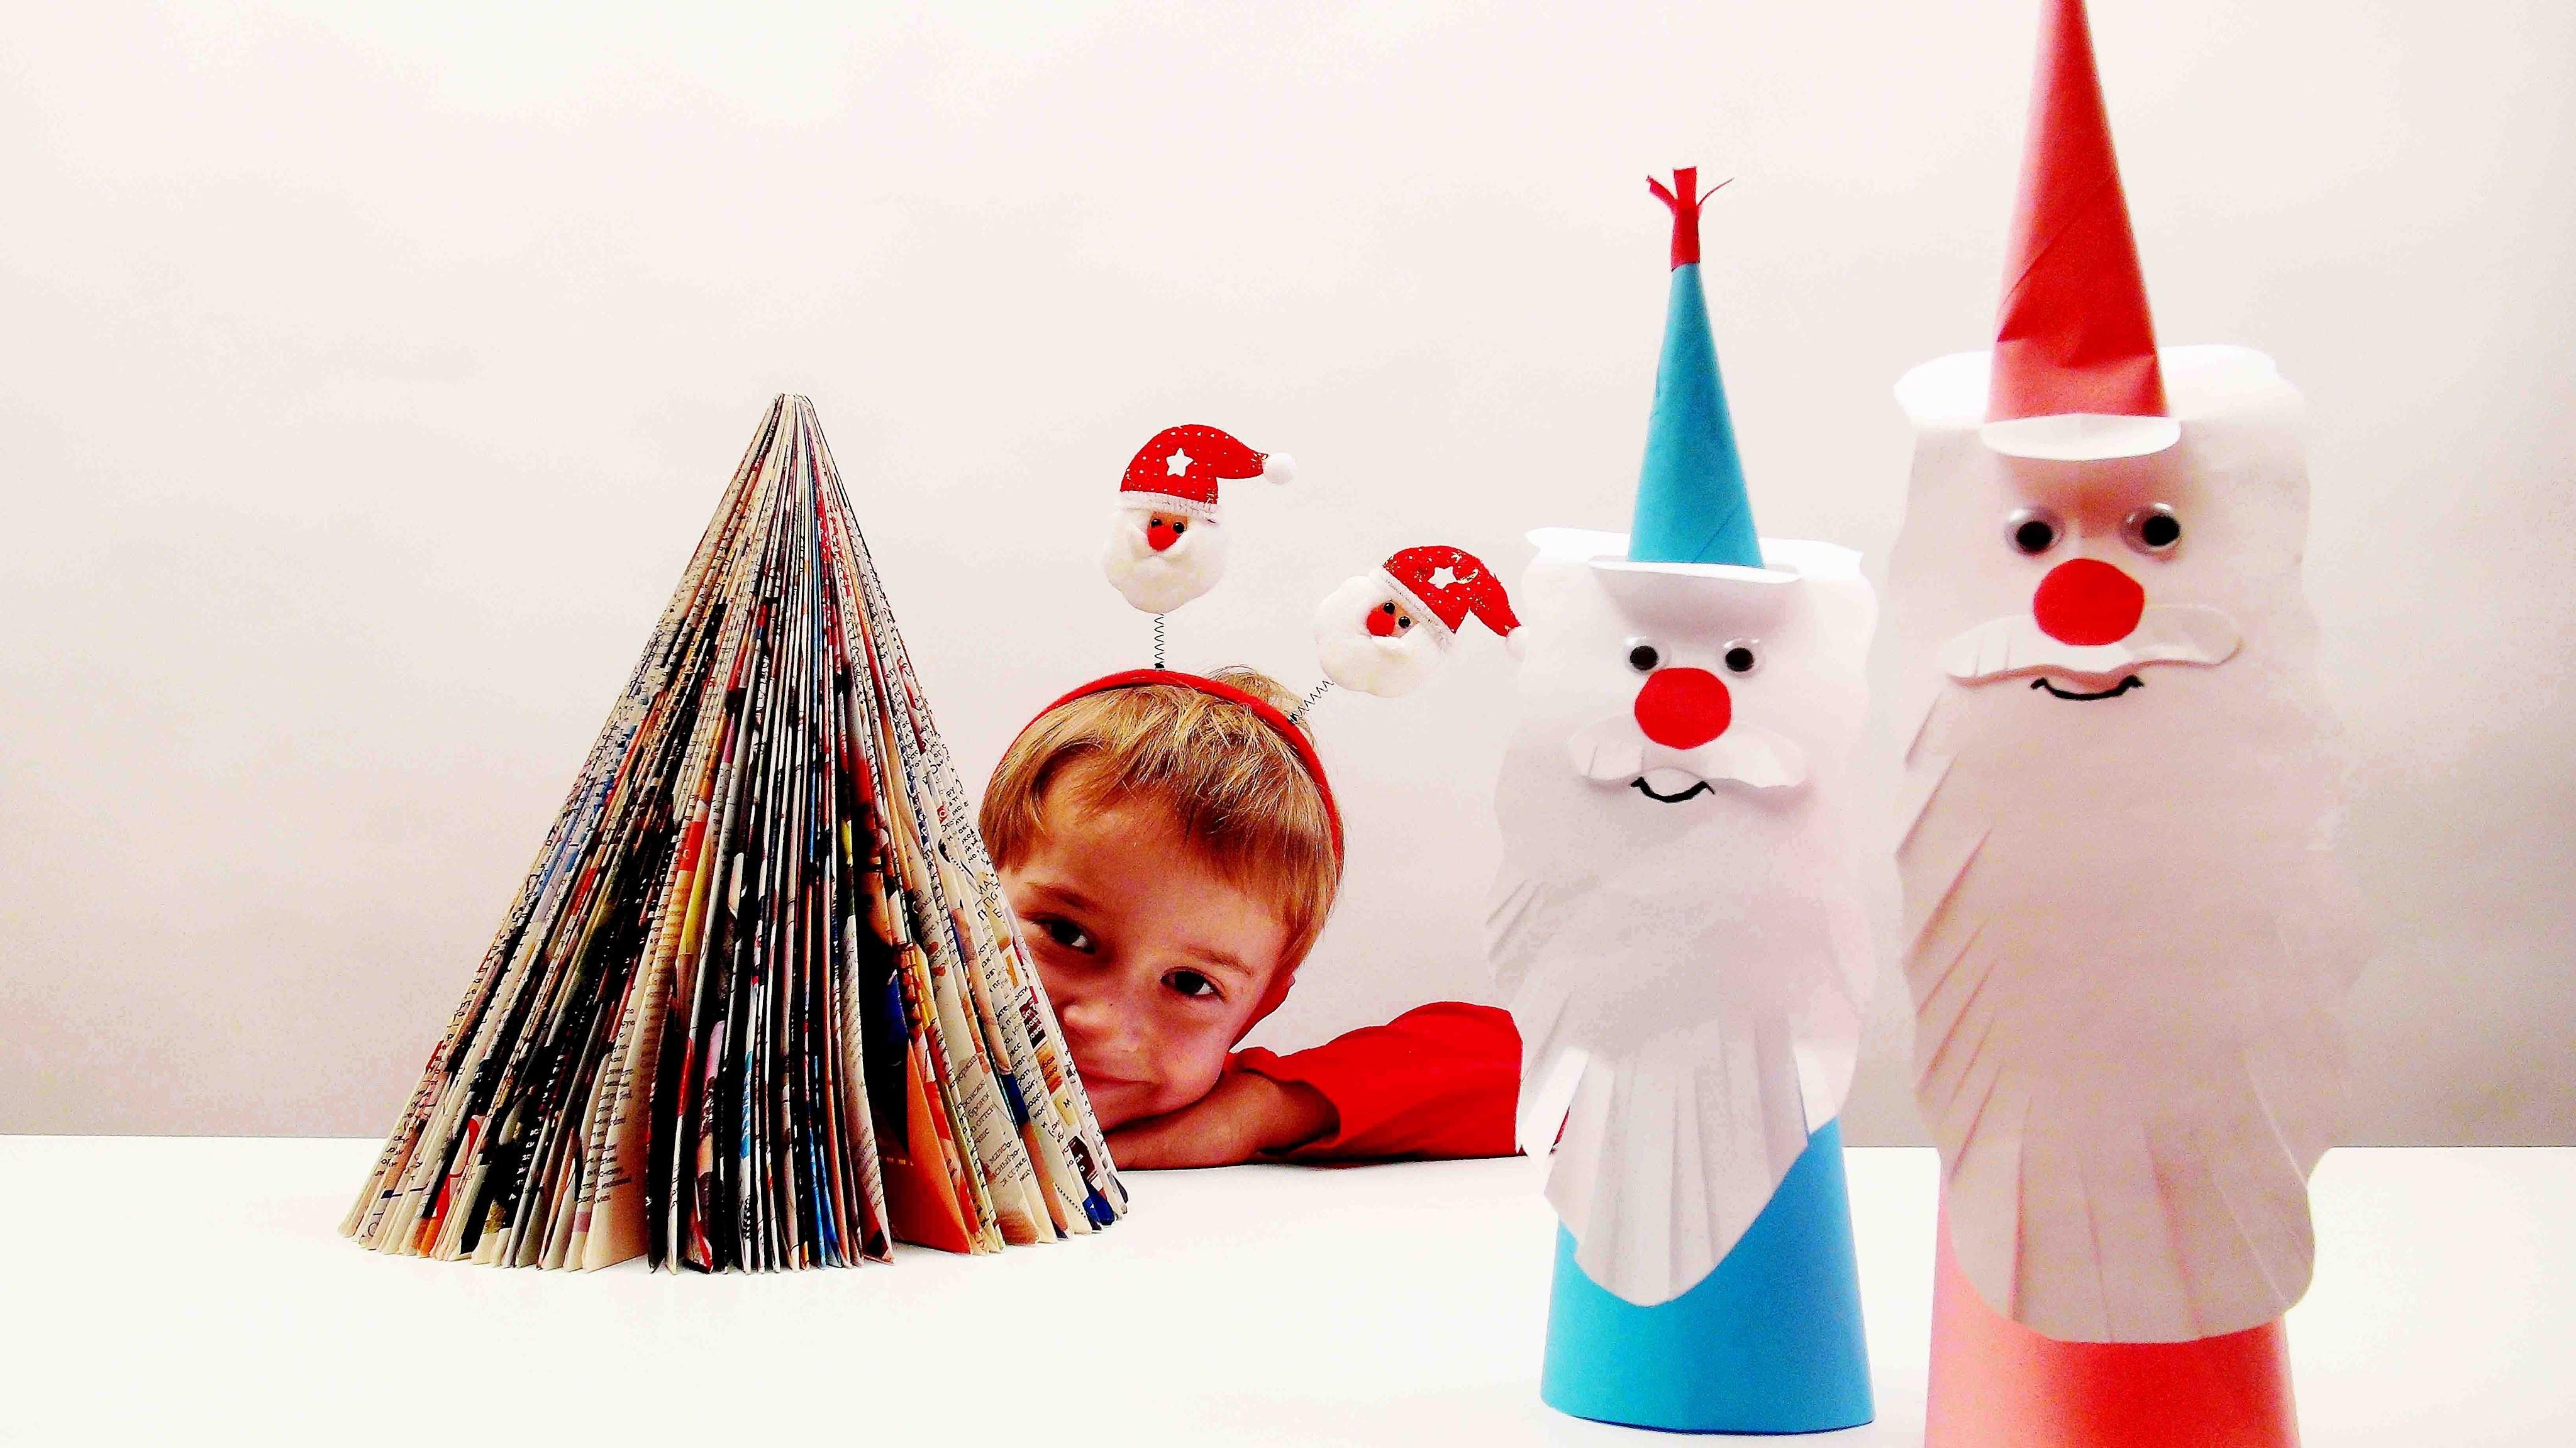 Master classes. DIY - Do it yourself. Paper Santa Claus.